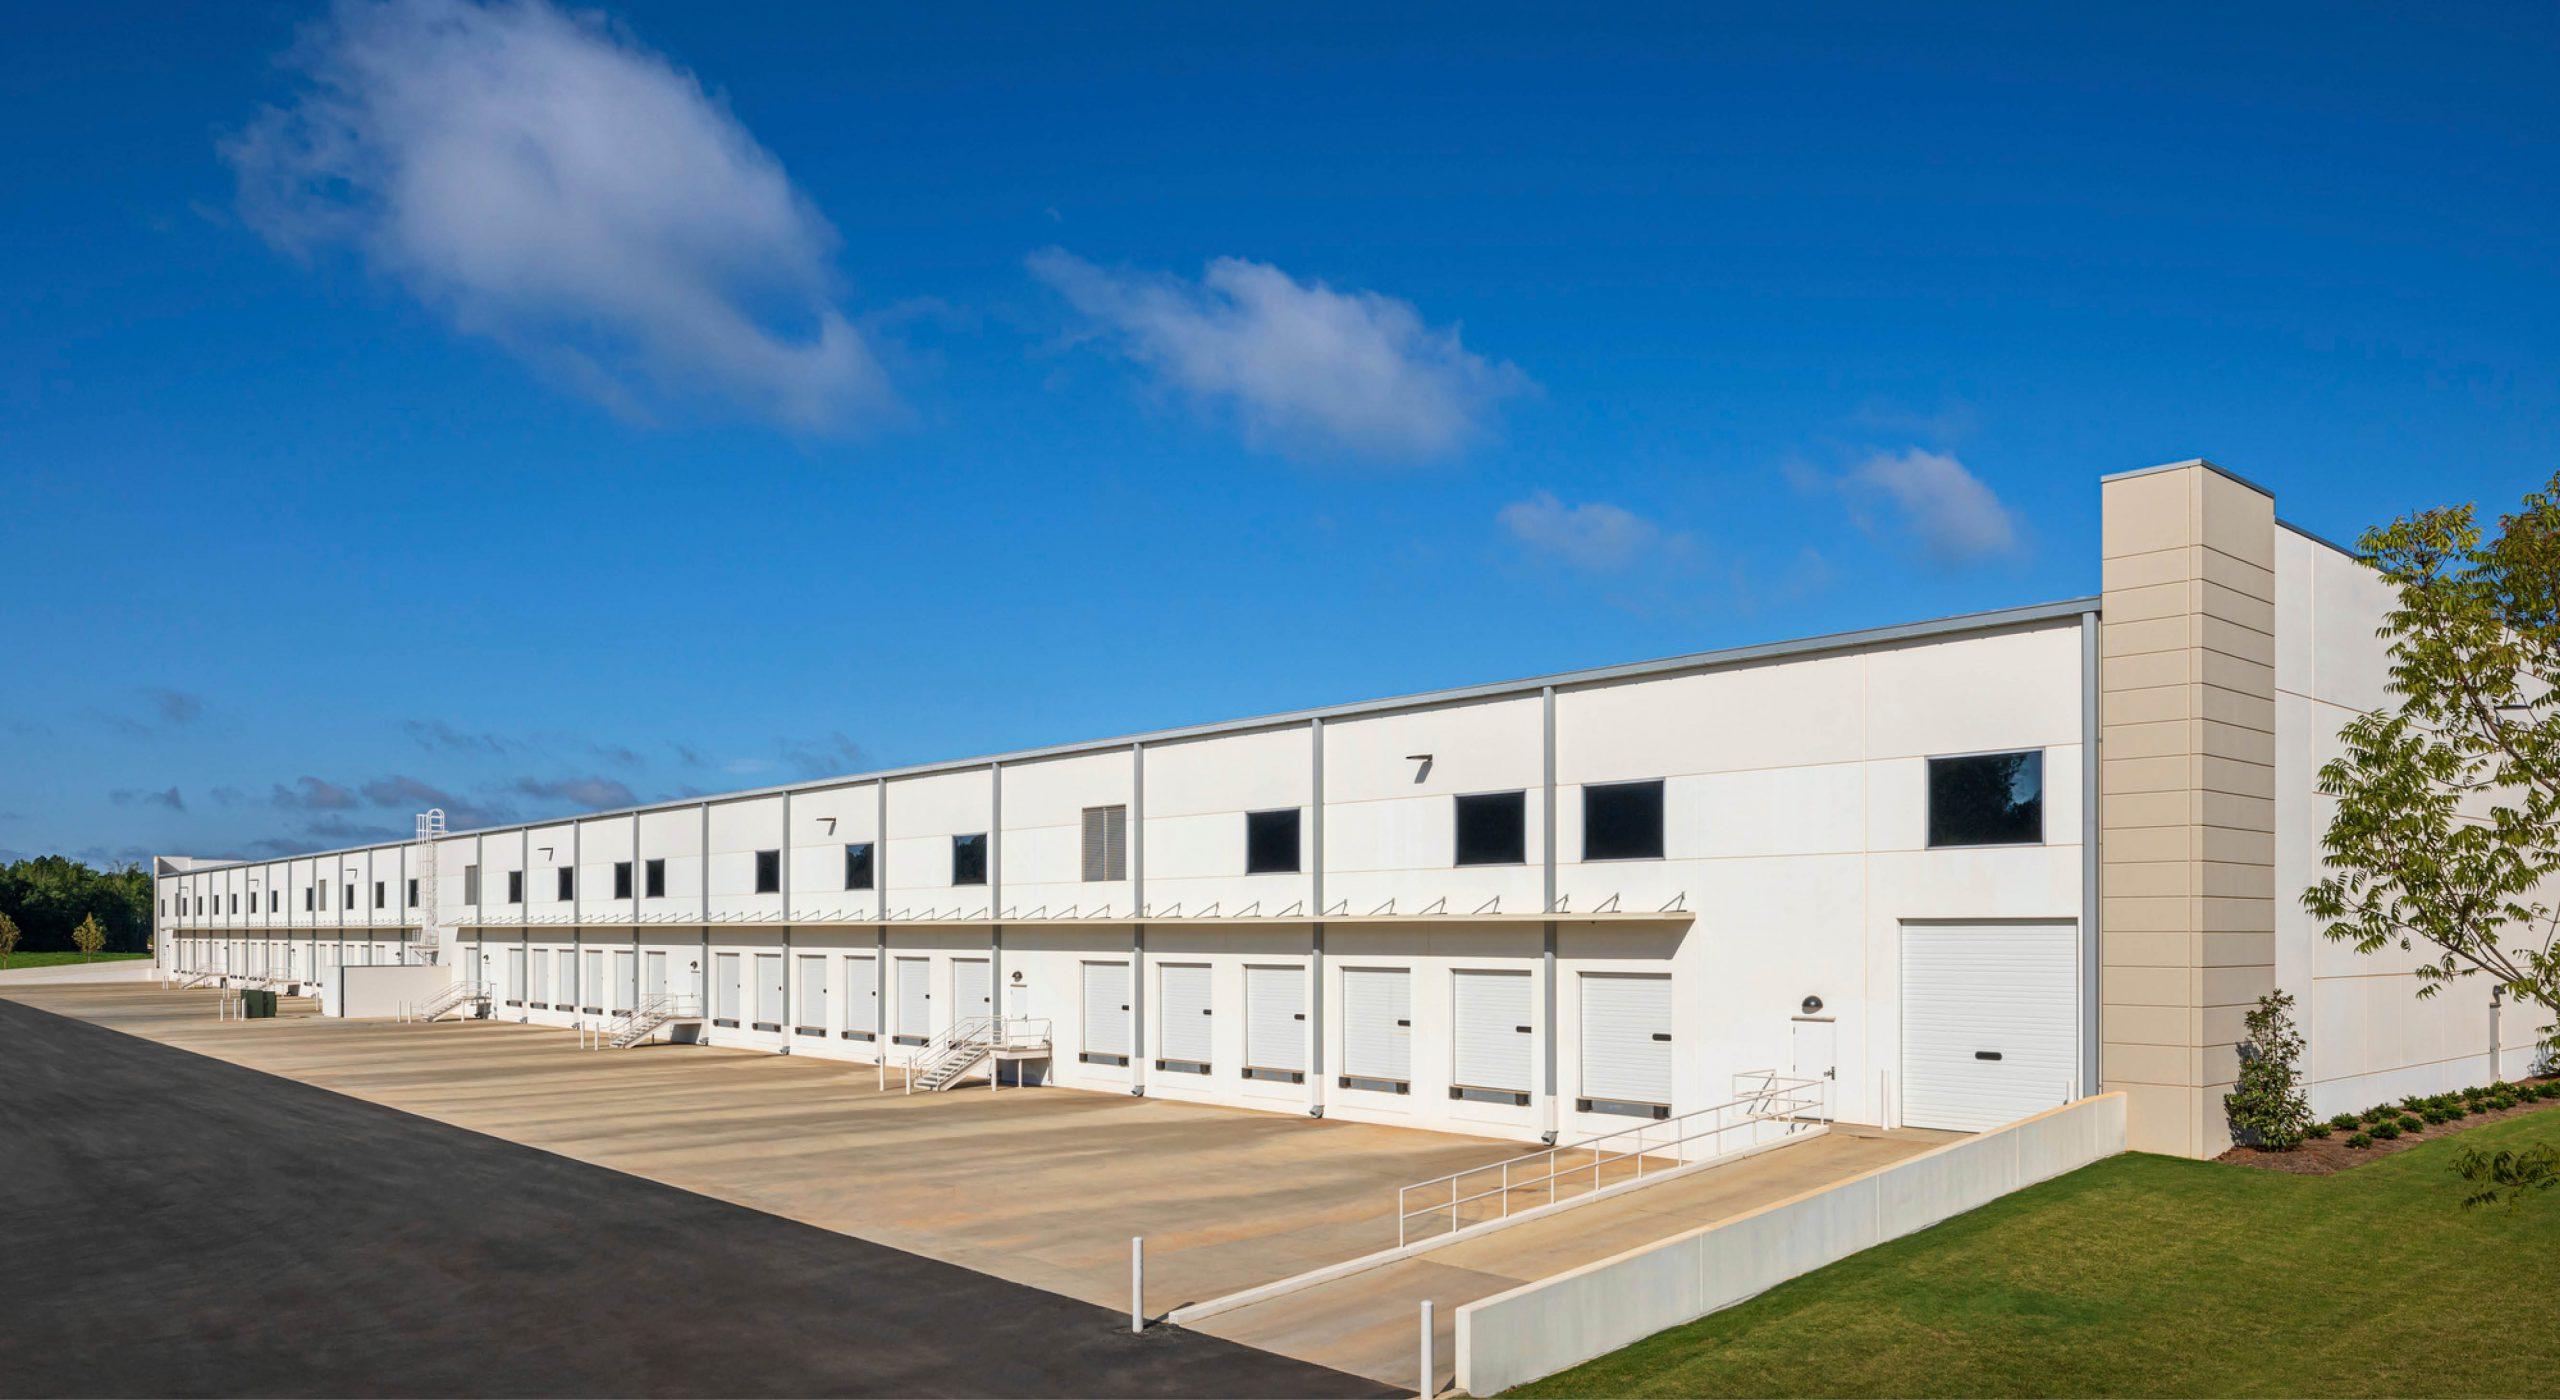 I-195 Lanier Logistics truck bays